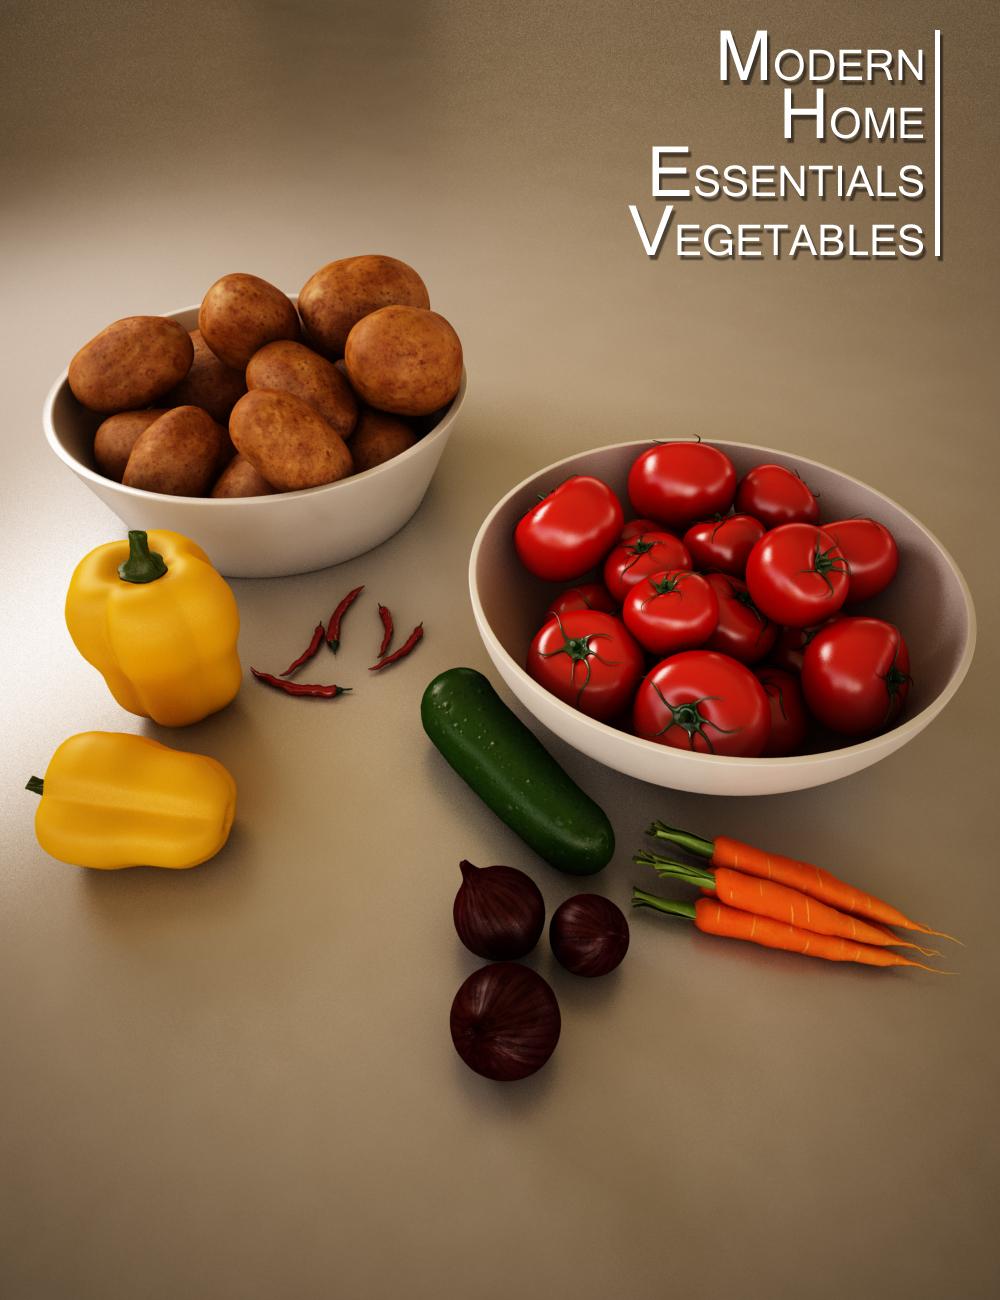 MHE: Vegetables by: Lantios, 3D Models by Daz 3D